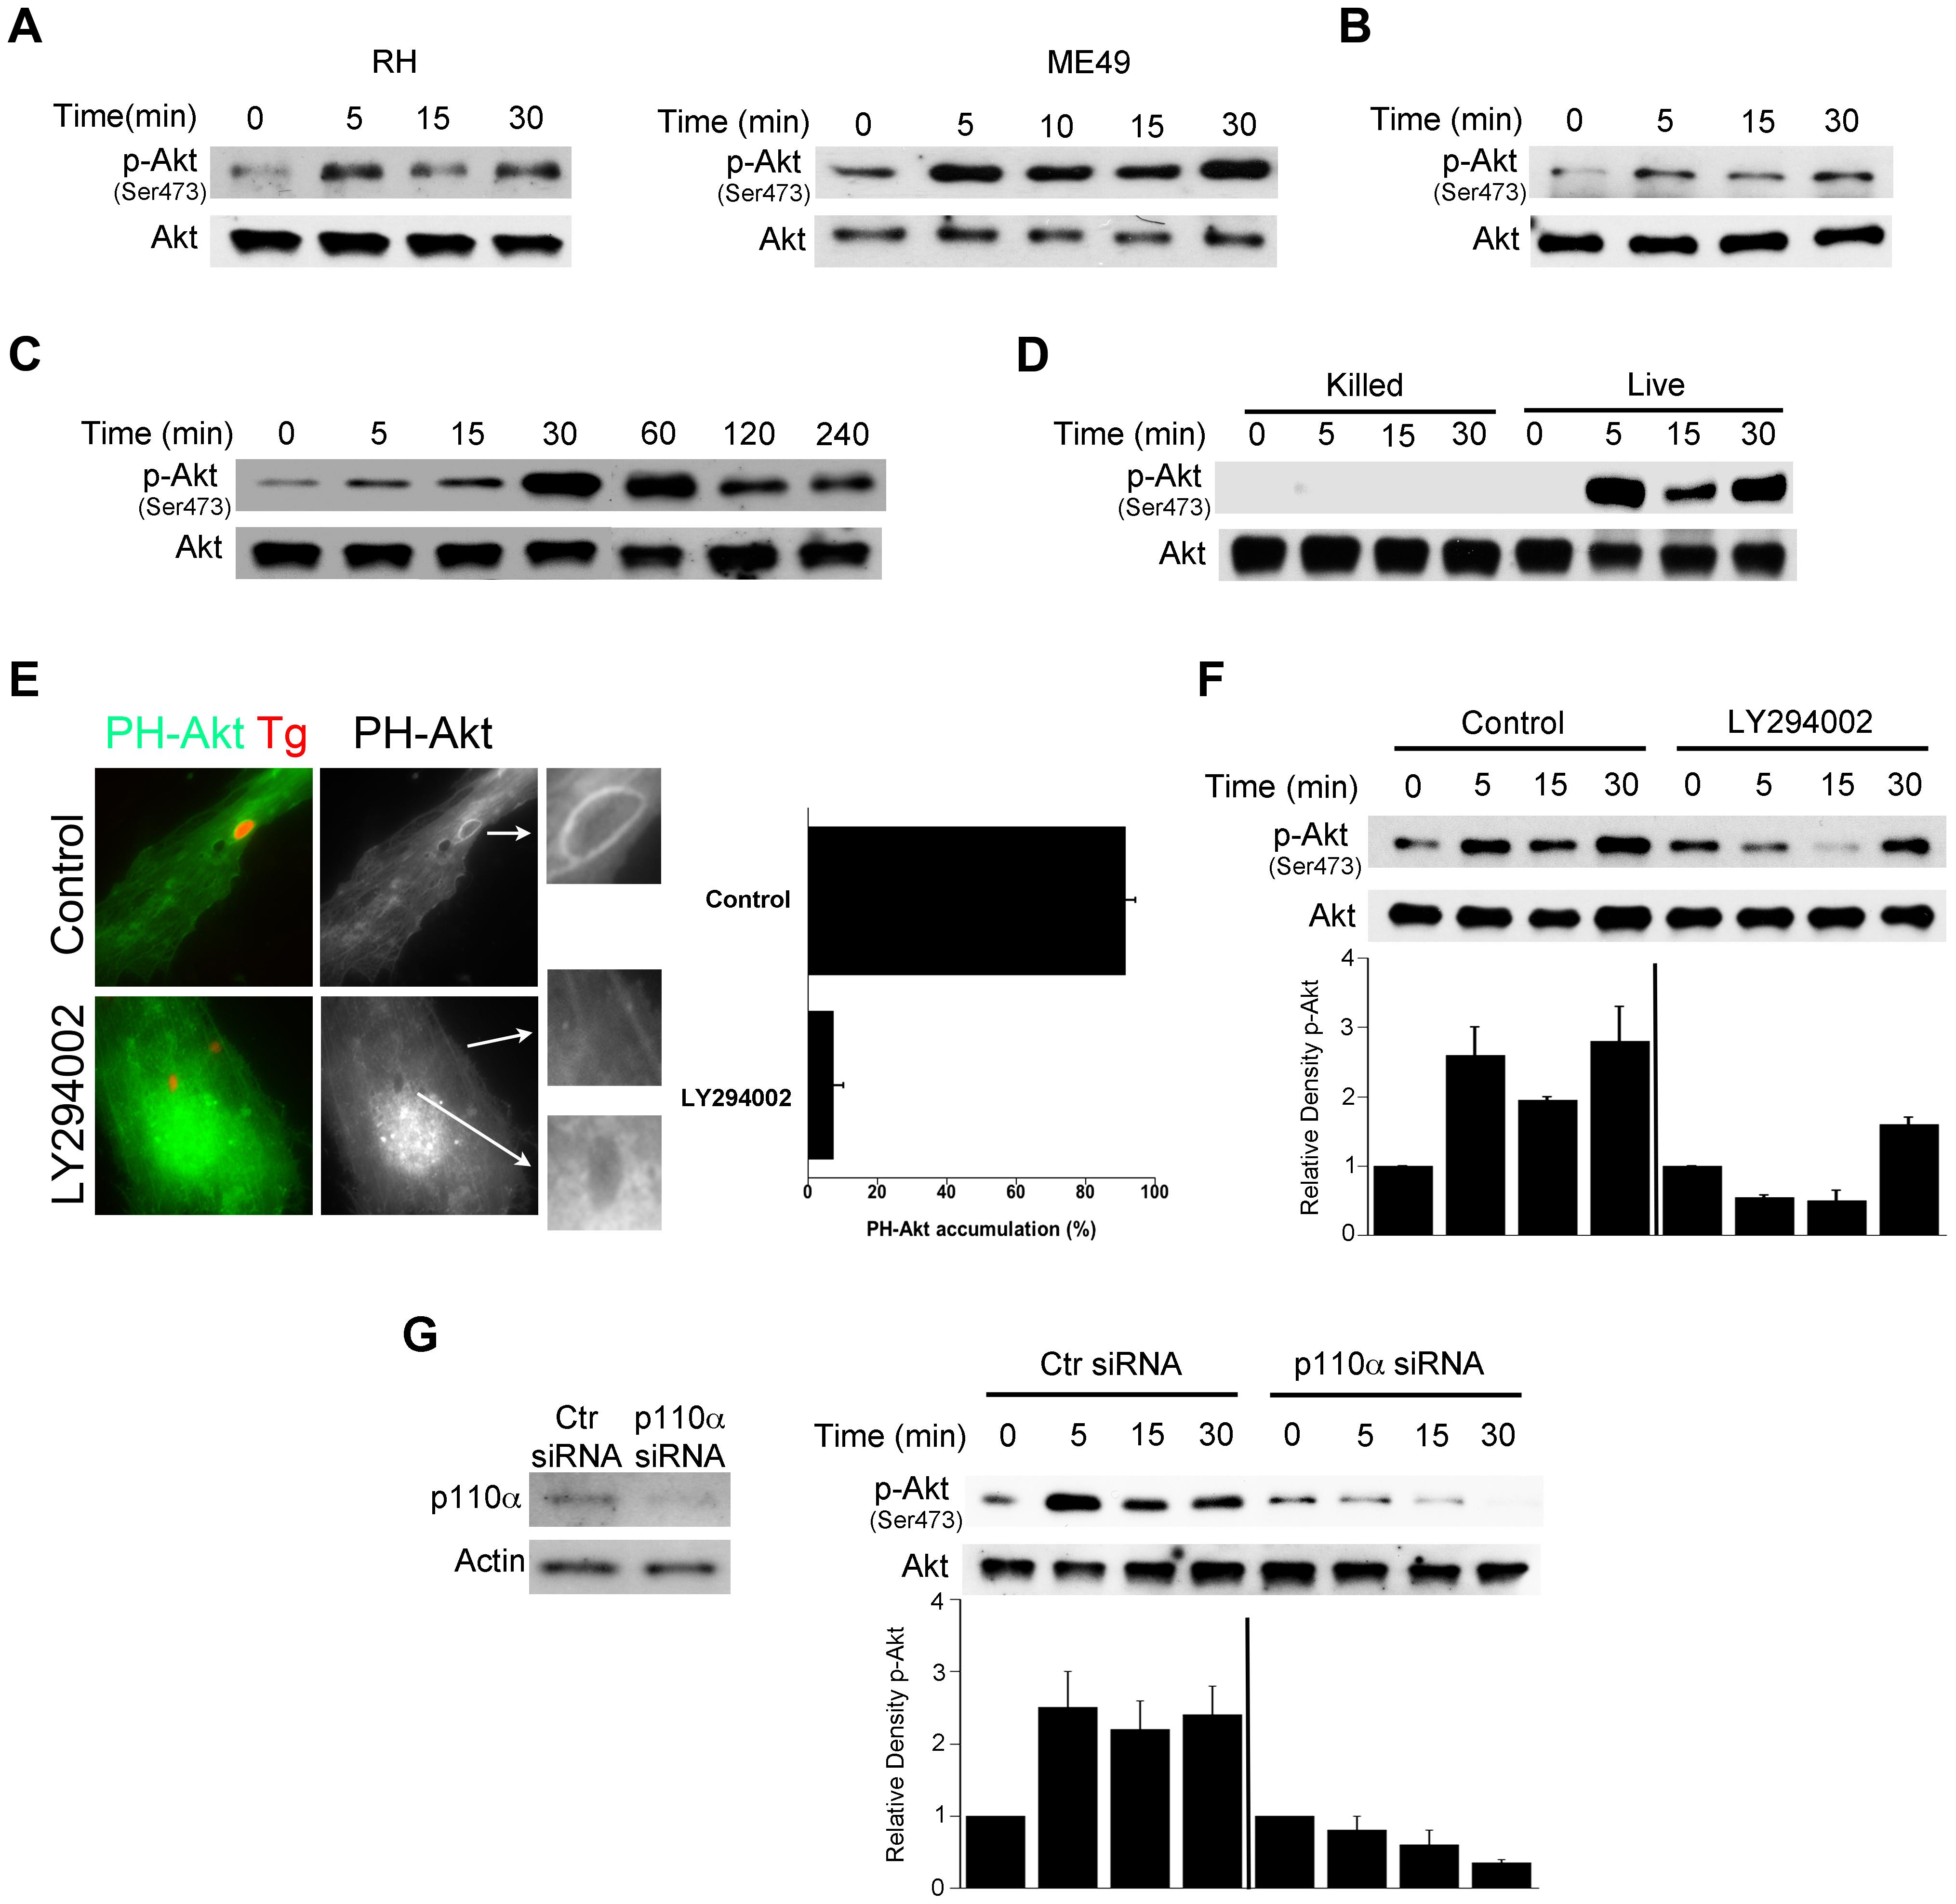 <i>T. gondii</i> induces Akt activation via PI3K signaling in non-hematopoietic cells.